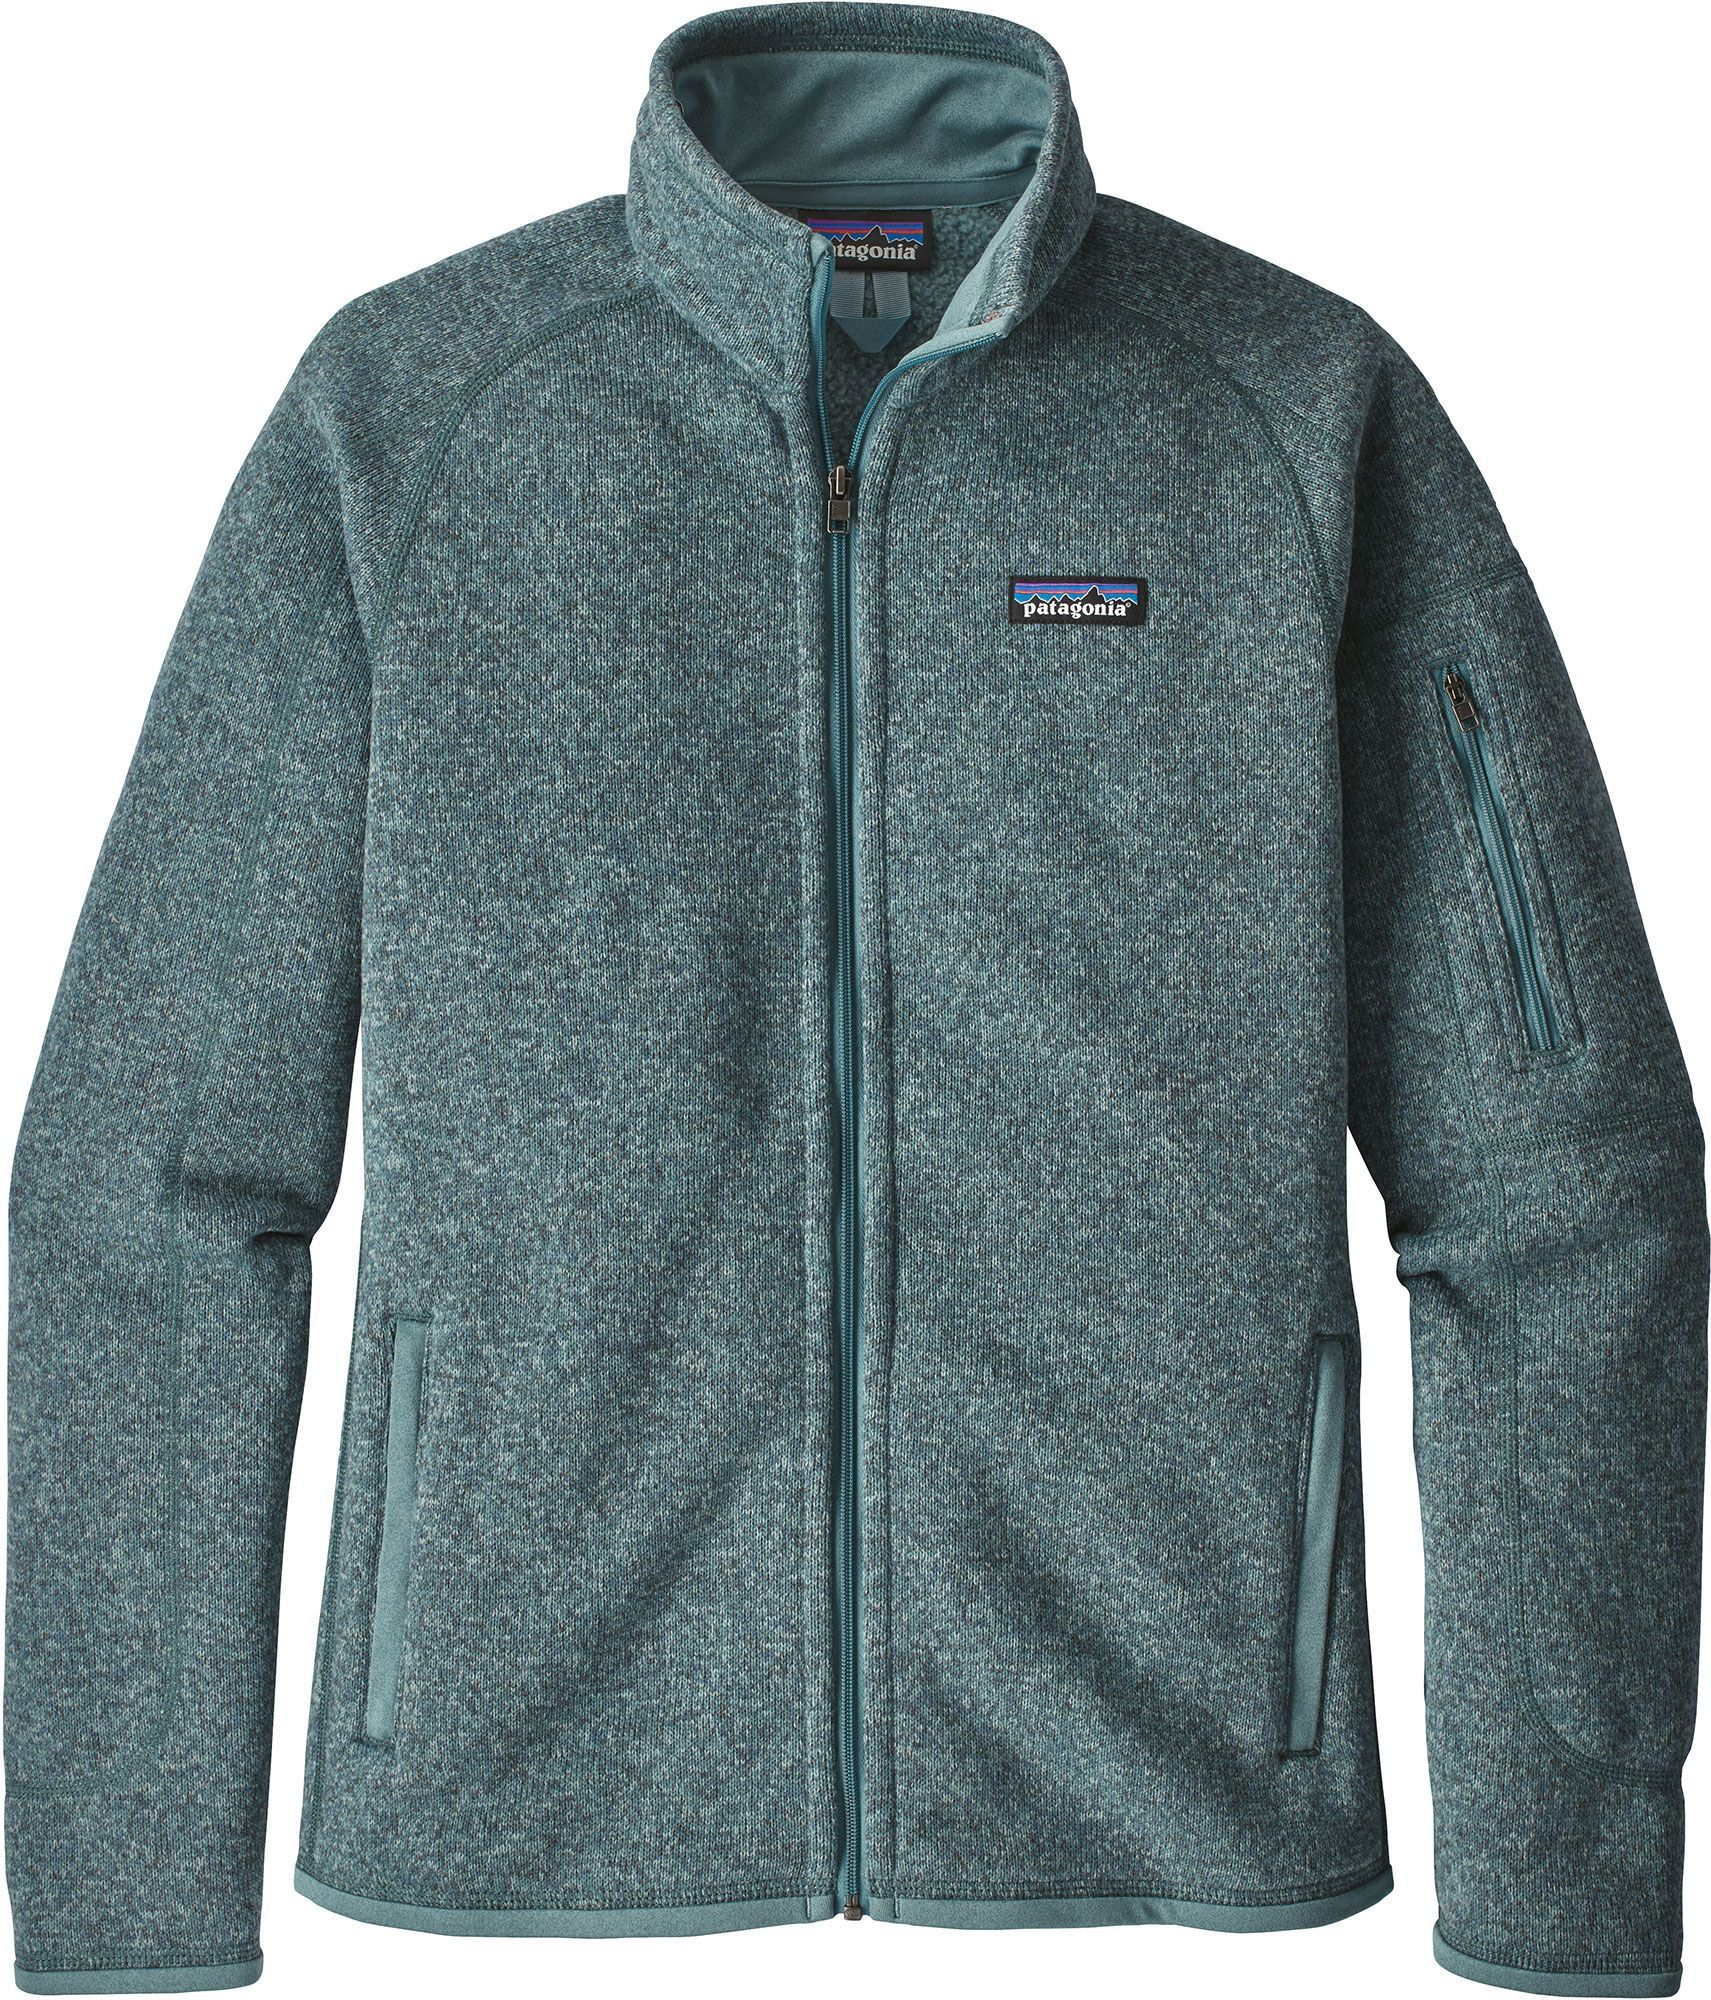 super popular 046bf 298be Patagonia Women's Better Sweater Fleece Jacket, Size: XS ...